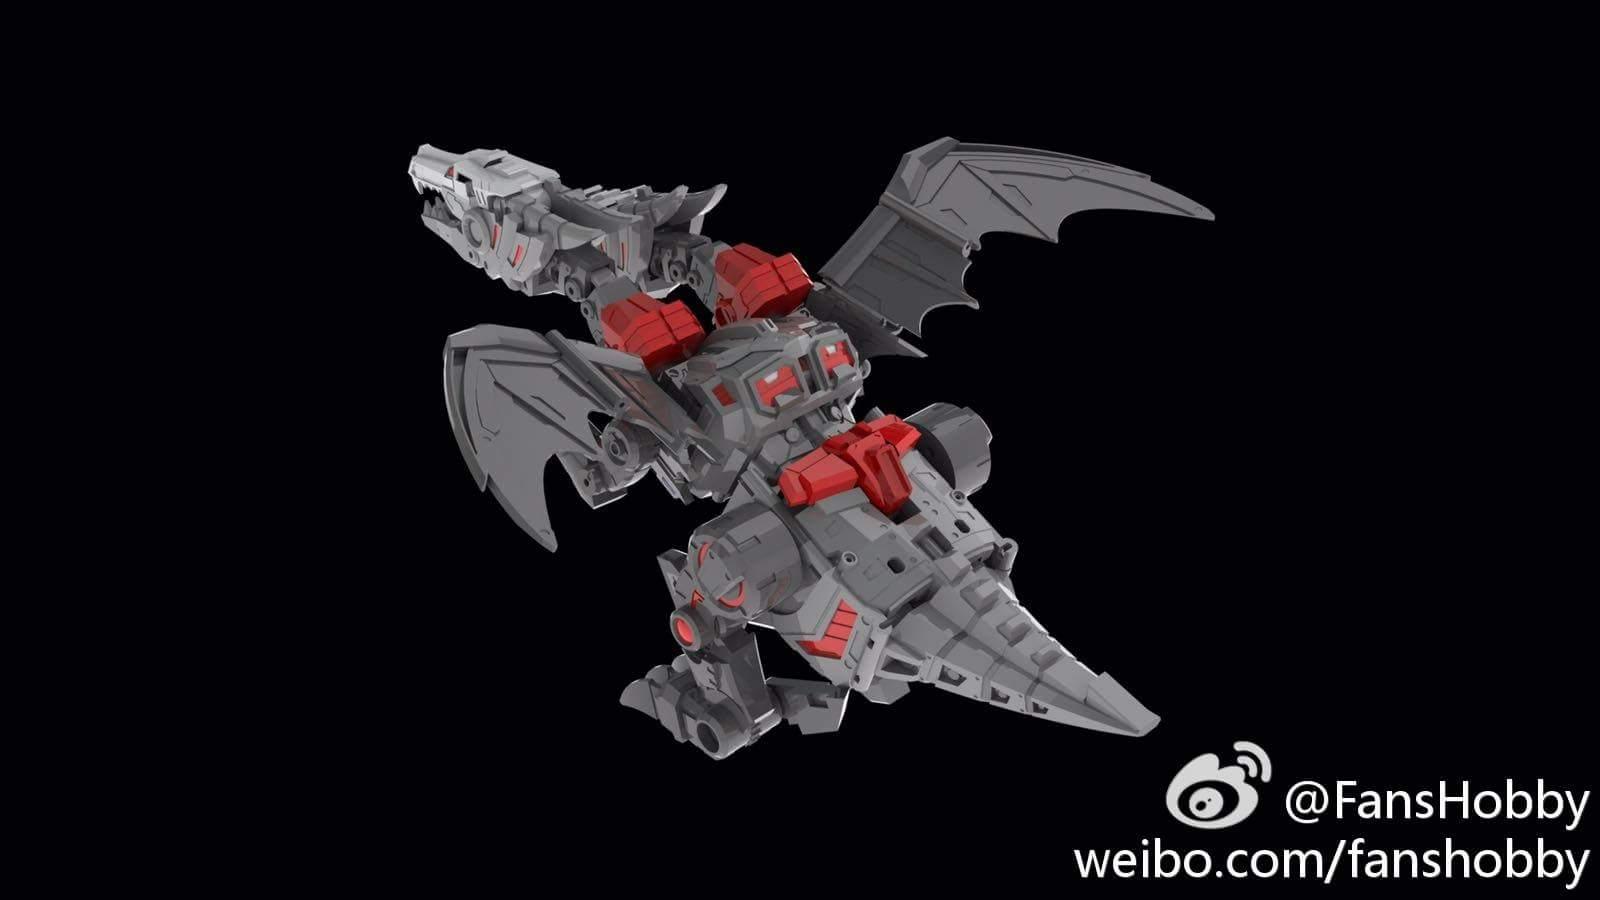 [FansHobby] Produit Tiers - Master Builder MB-02/03/05 - aka Monsterbots/Monstrebots - Page 2 R61ZloaW